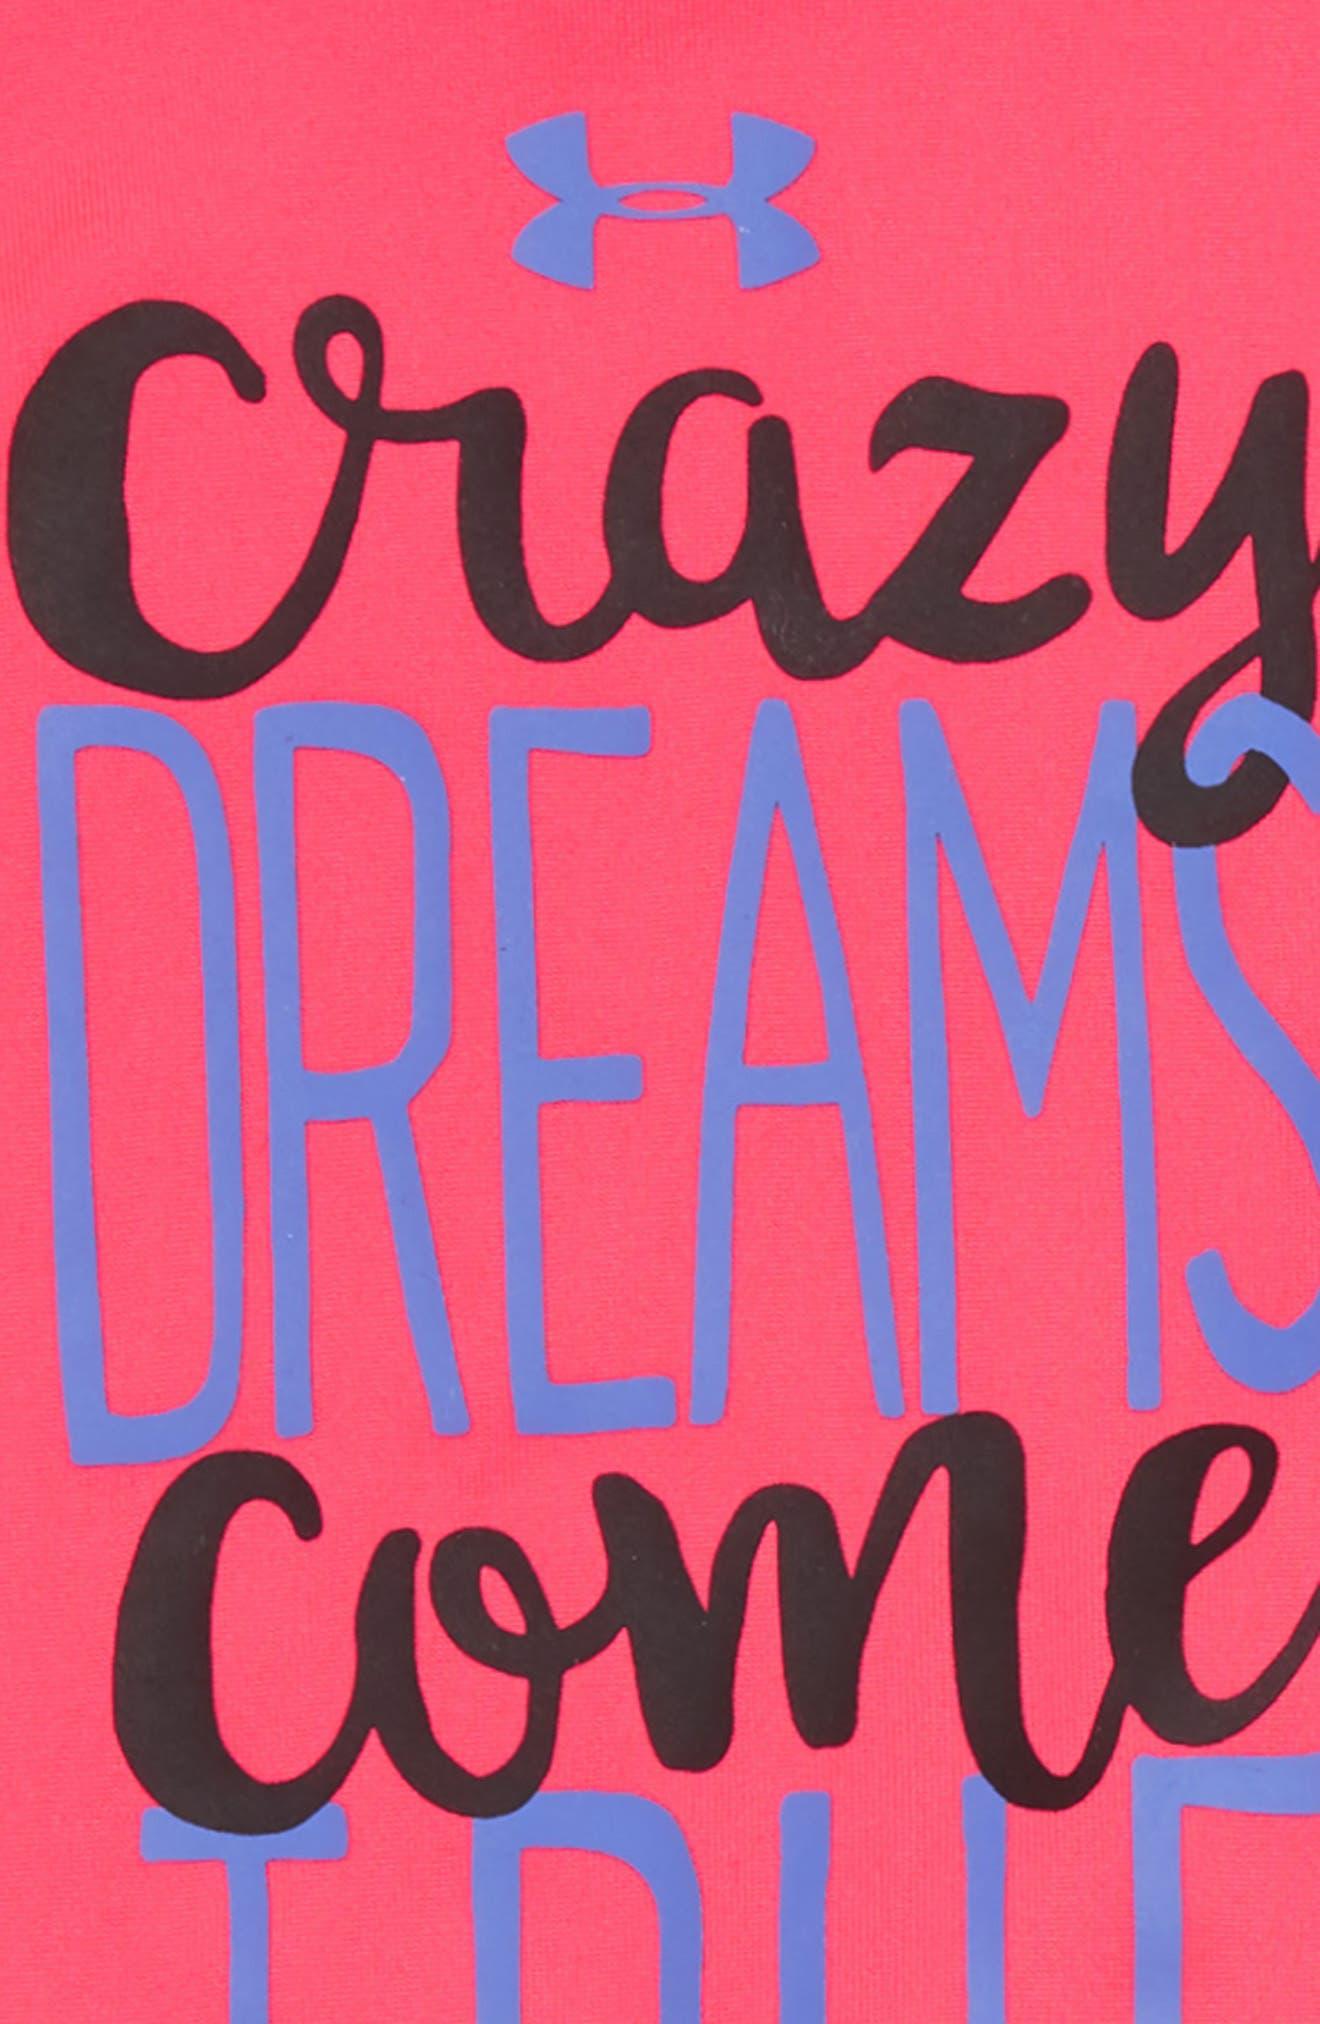 Crazy Dreams Come True Tee & Leggings Set,                             Alternate thumbnail 2, color,                             670